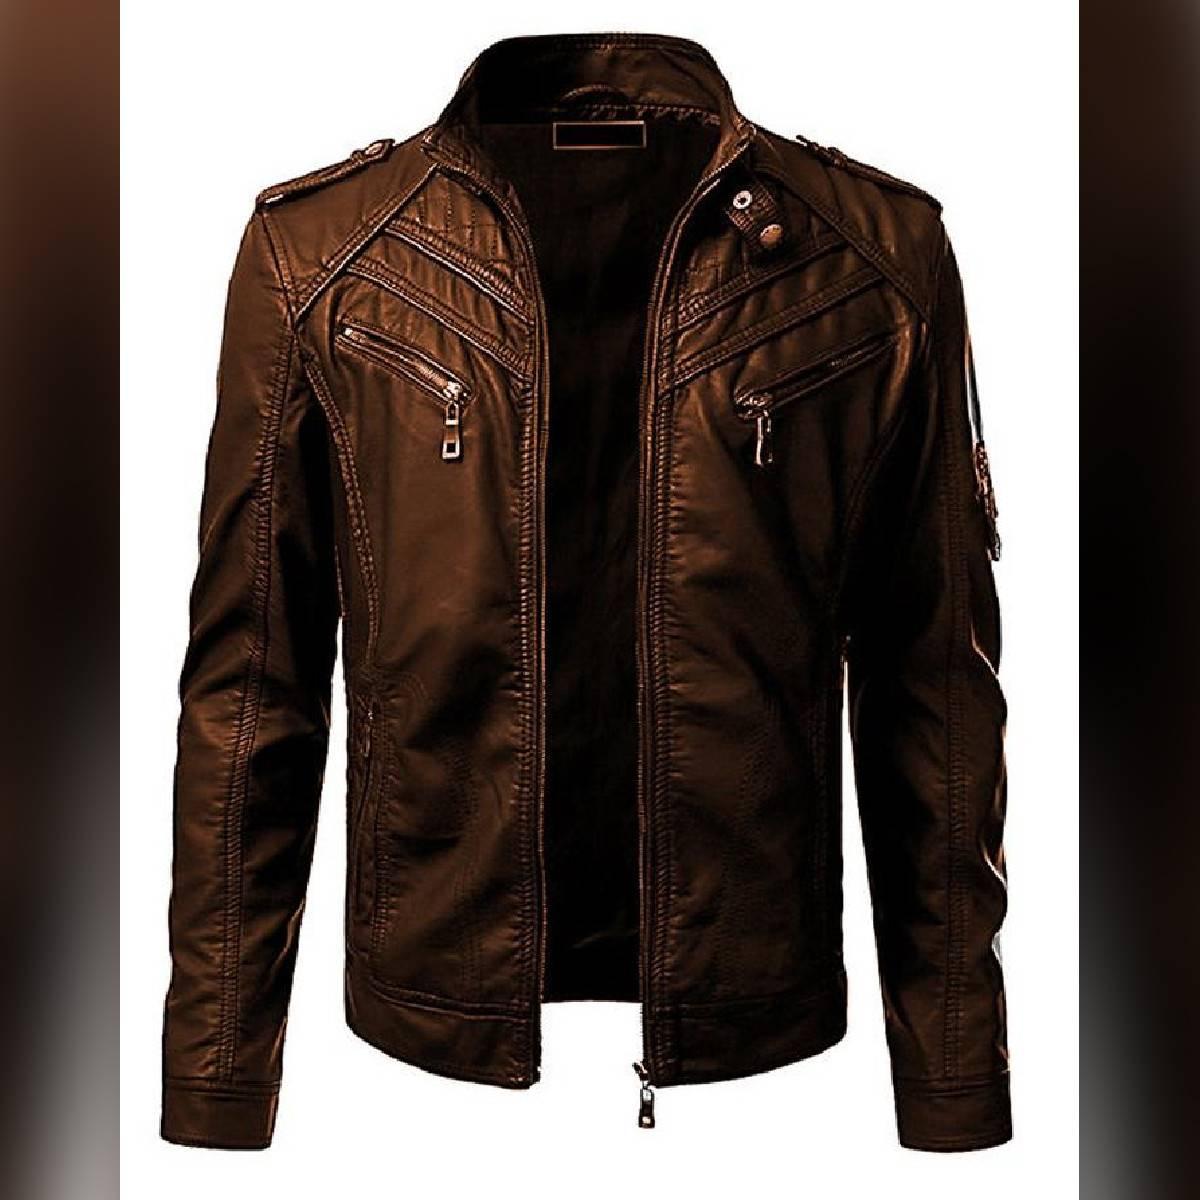 Brown Leather Jacket For Men